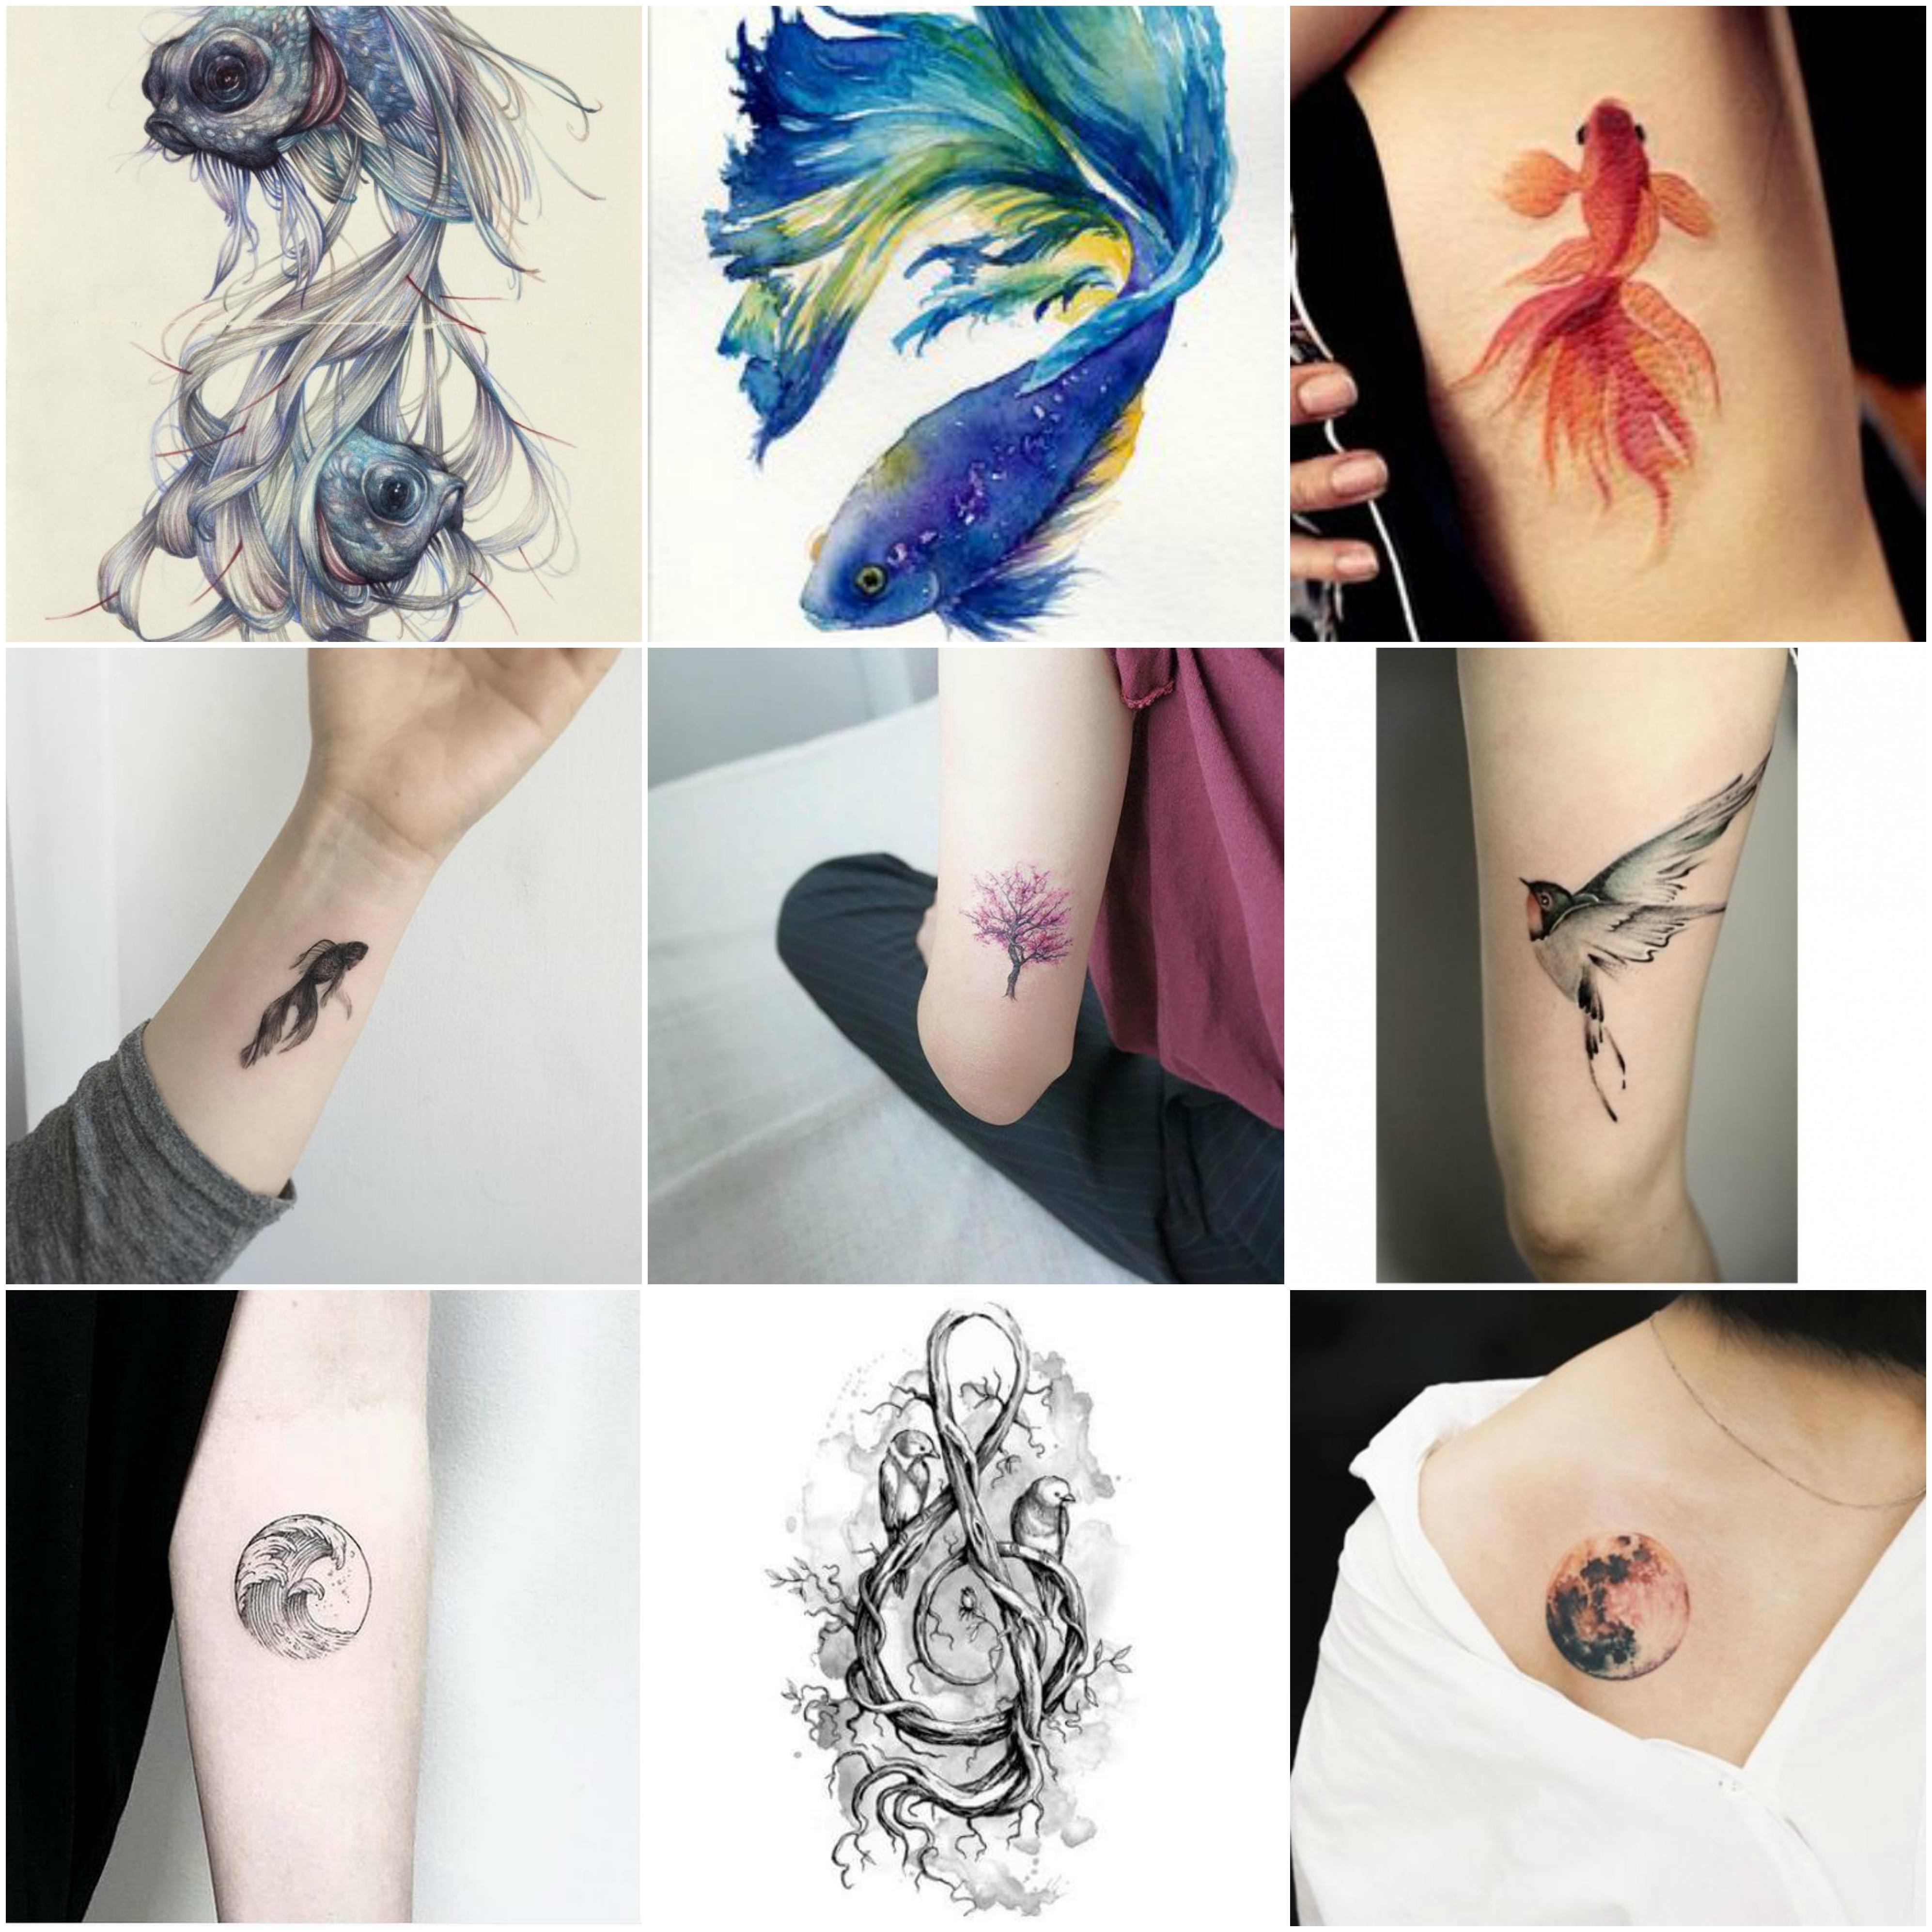 Pomysły Na Tatuaże Zapytajonetpl